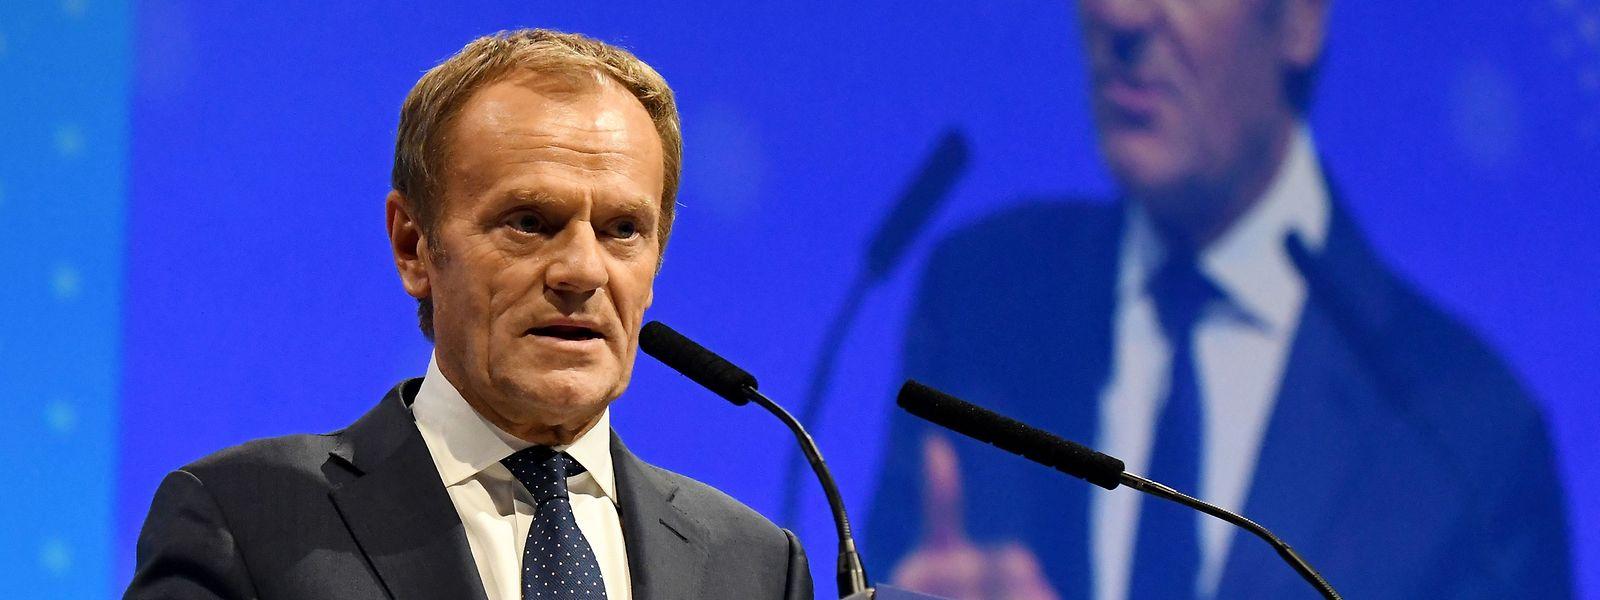 Donald Tusk attackierte den Kurs des ungarischen Ministerpräsidenten Orban.